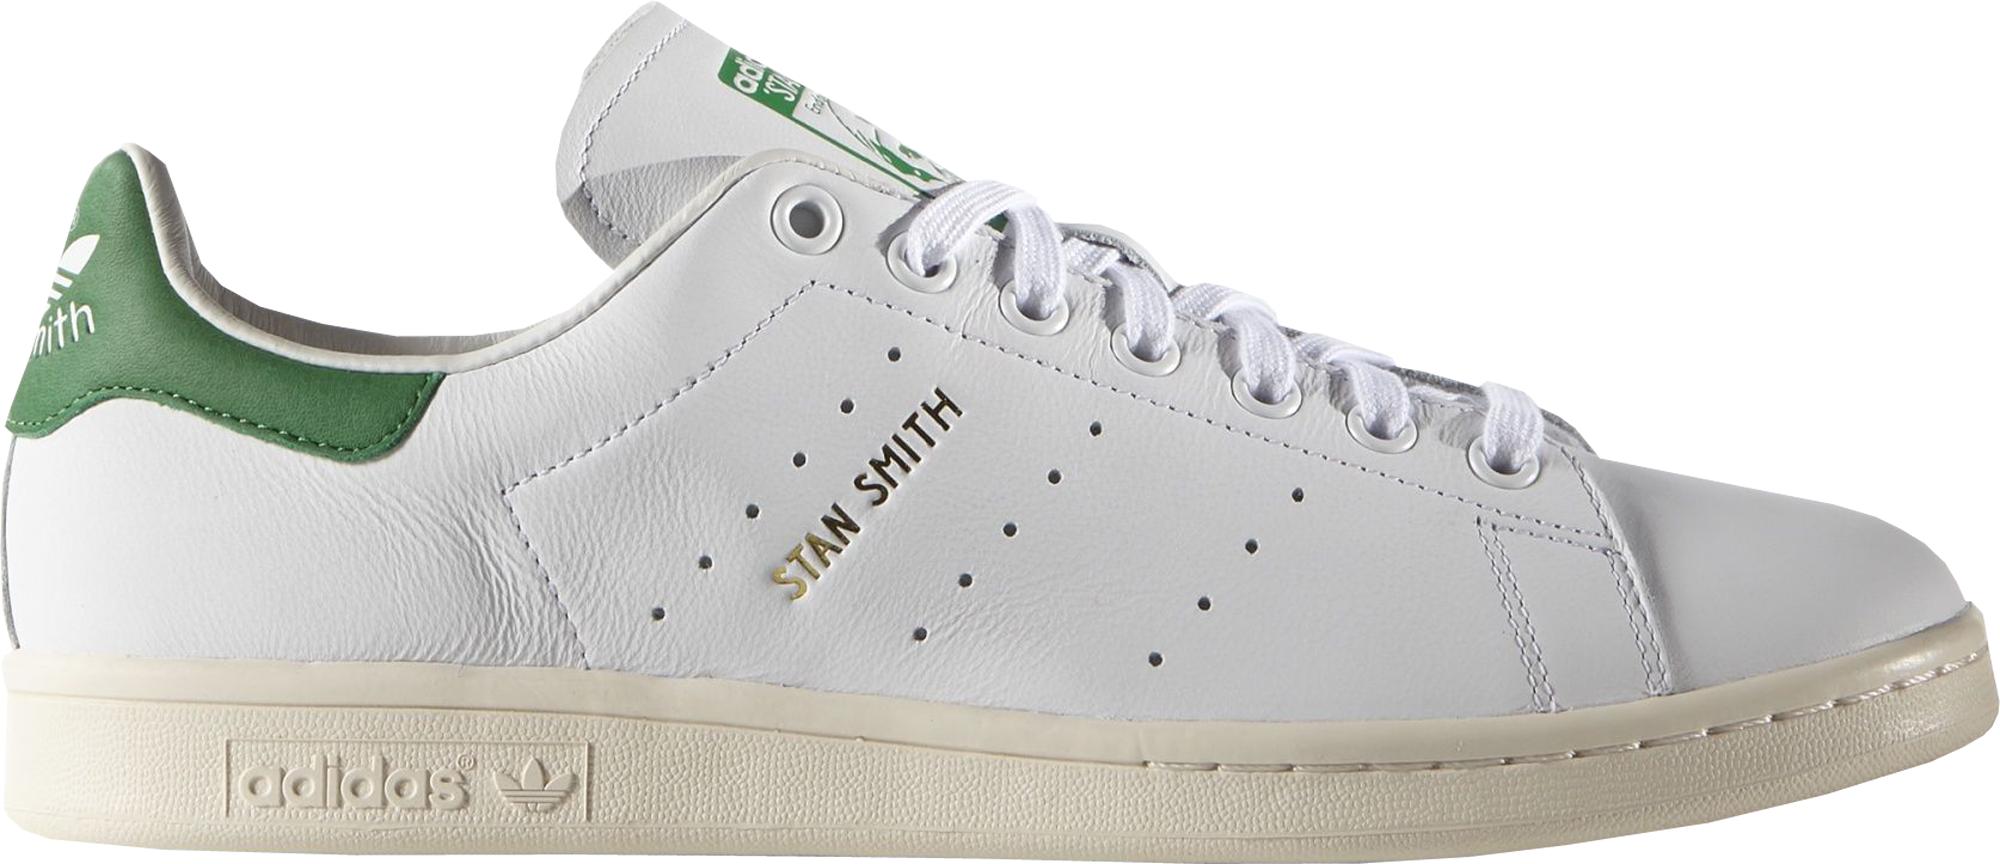 adidas Stan Smith Vintage OG Green